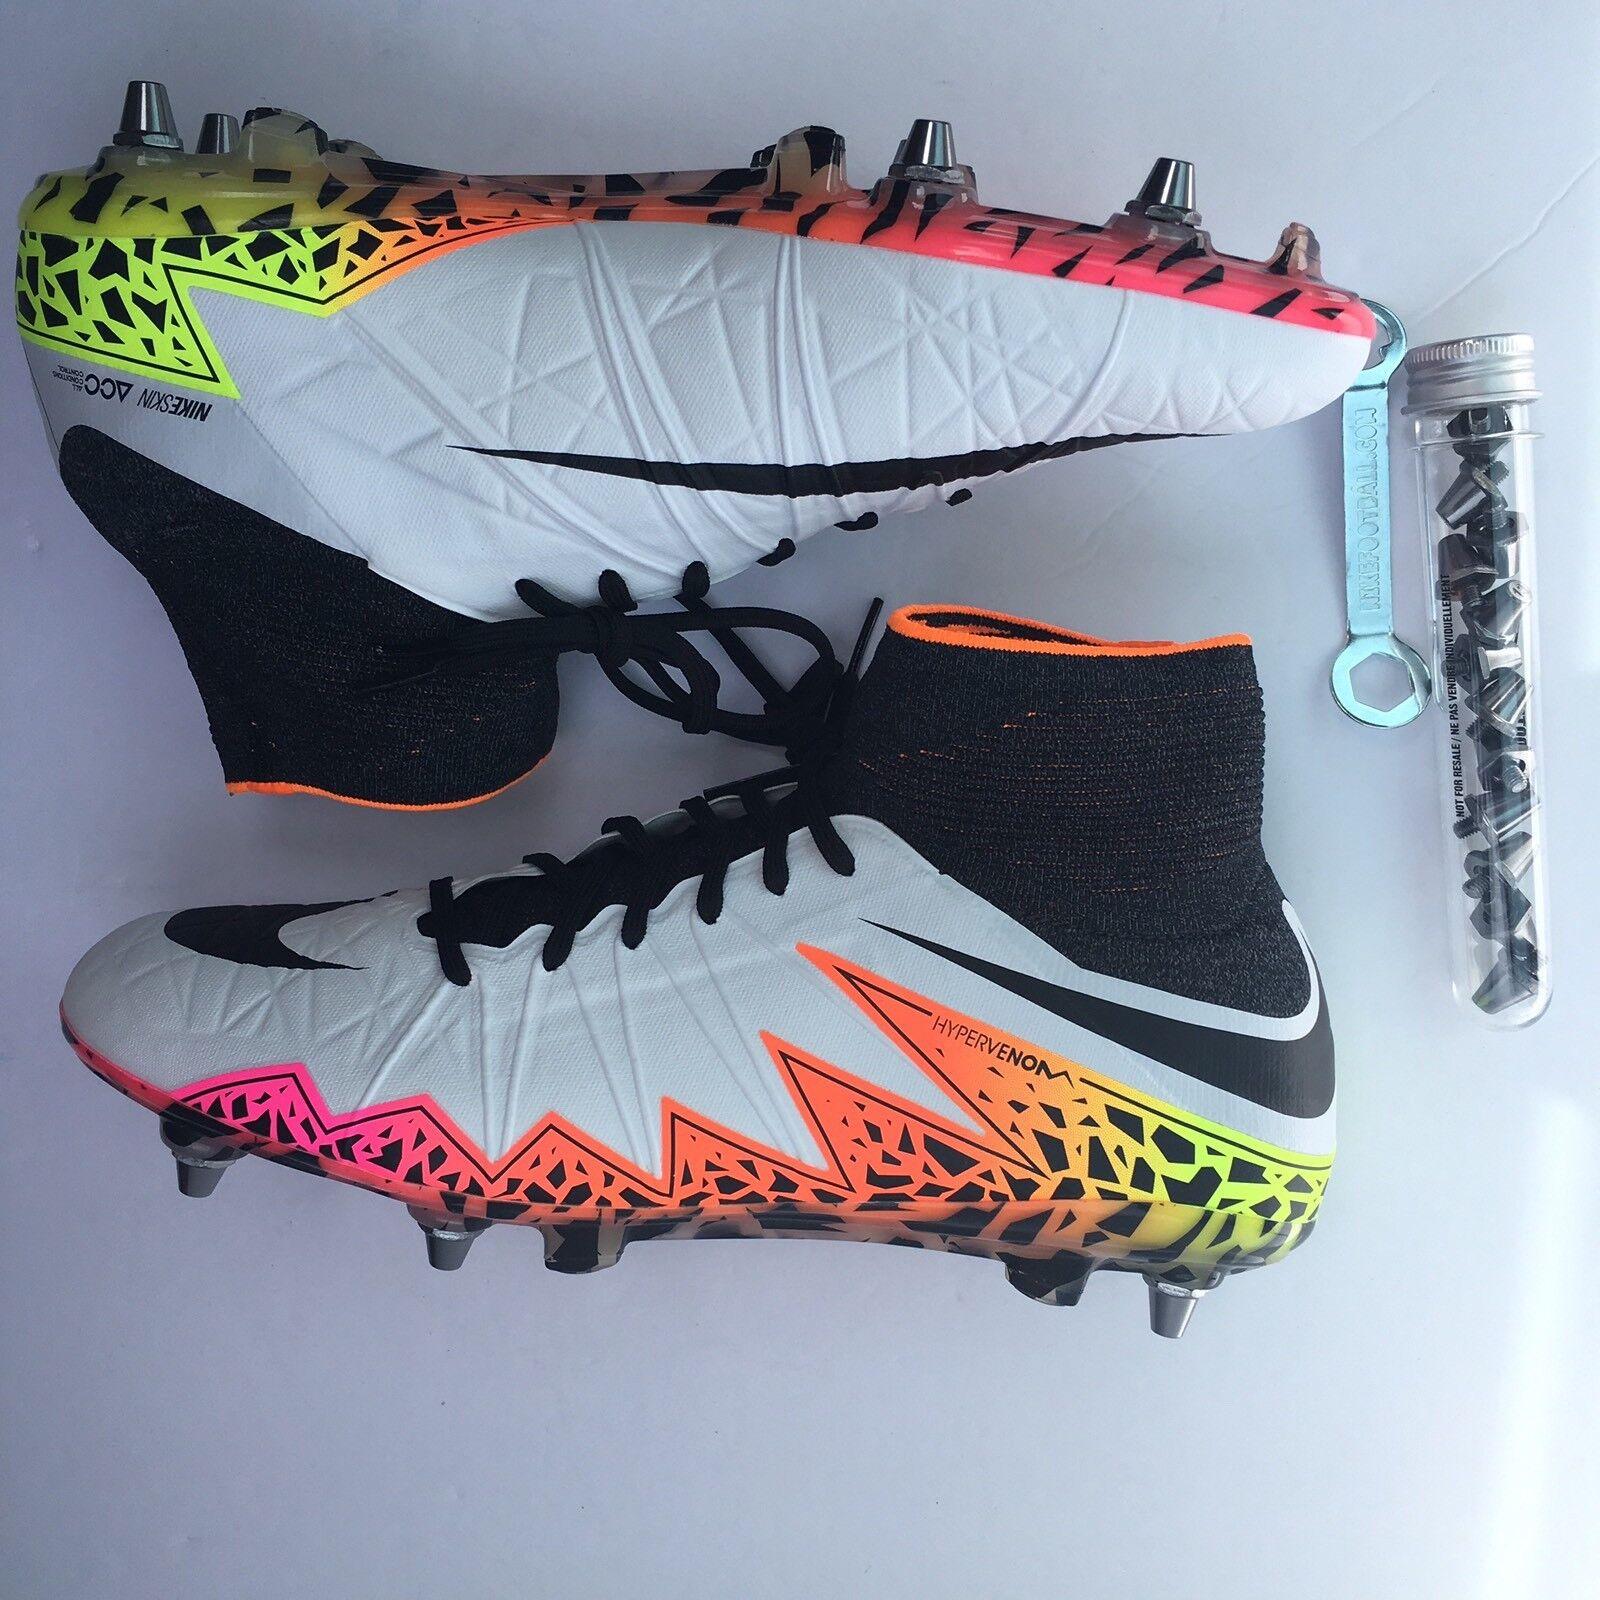 Nike hypervenom phantom ii sg pro calcio stivali 747489 109 gli scarpini da calcio sz 11